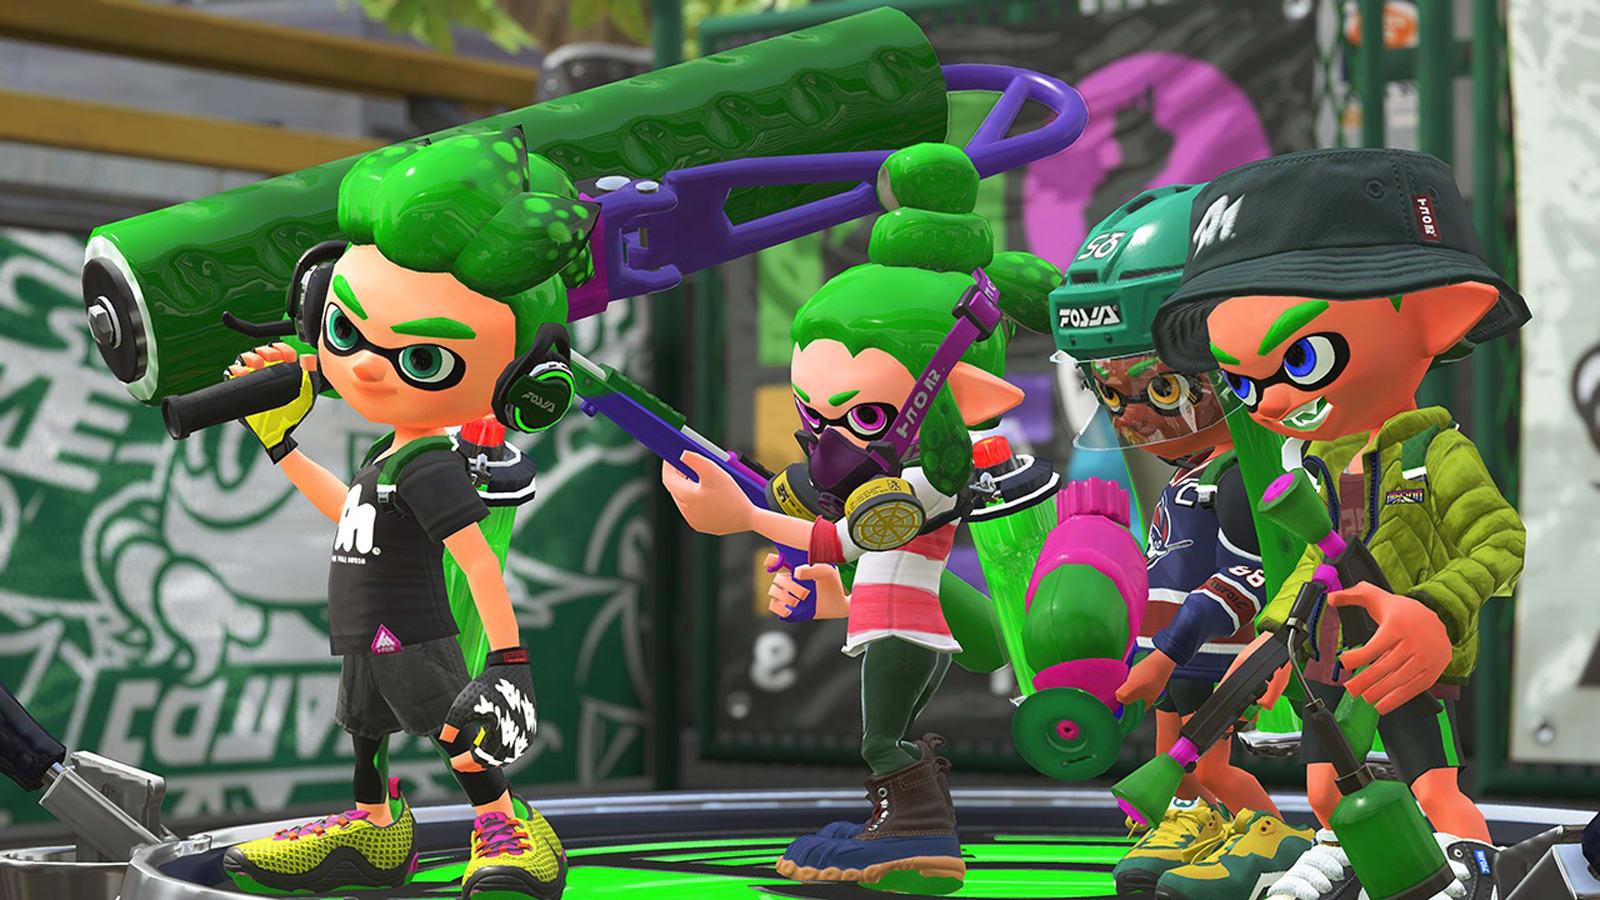 Splatoon 2 Habra Beta Abierta Gratis Para Nintendo Switch En Marzo